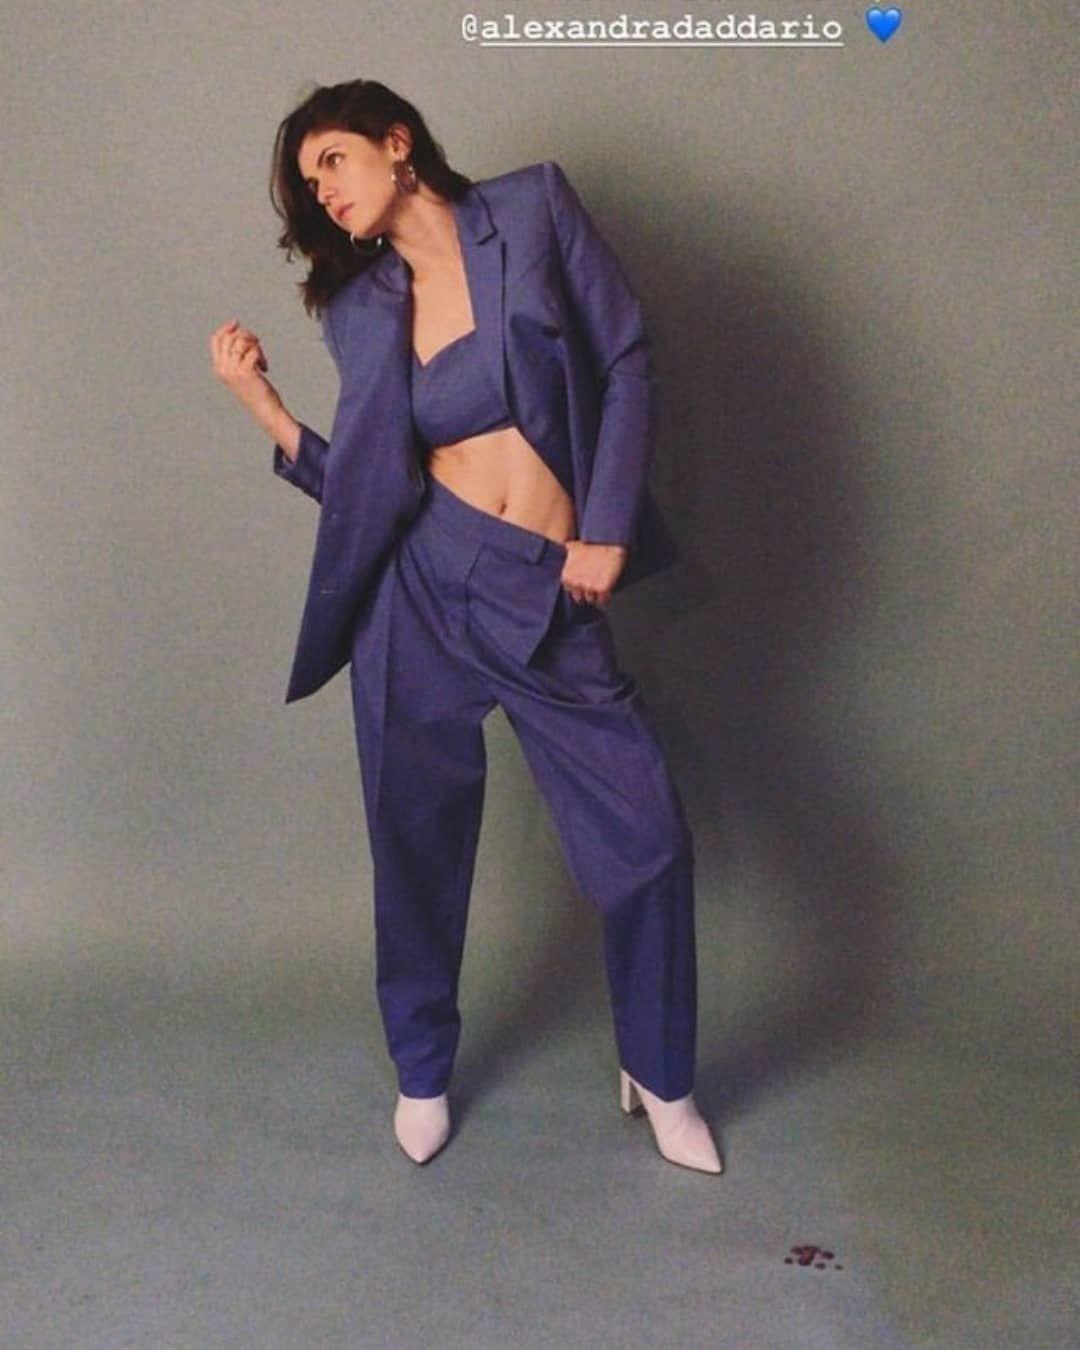 Alexandra Daddario Biography Net Worth Age Movies List